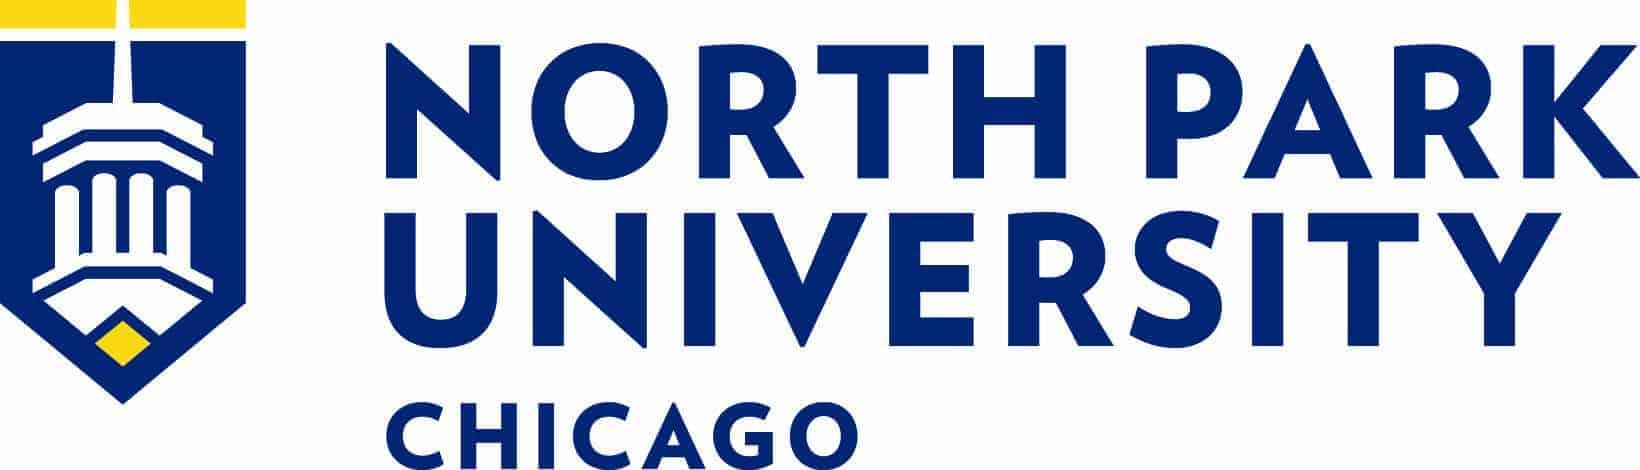 north park university logo 7853